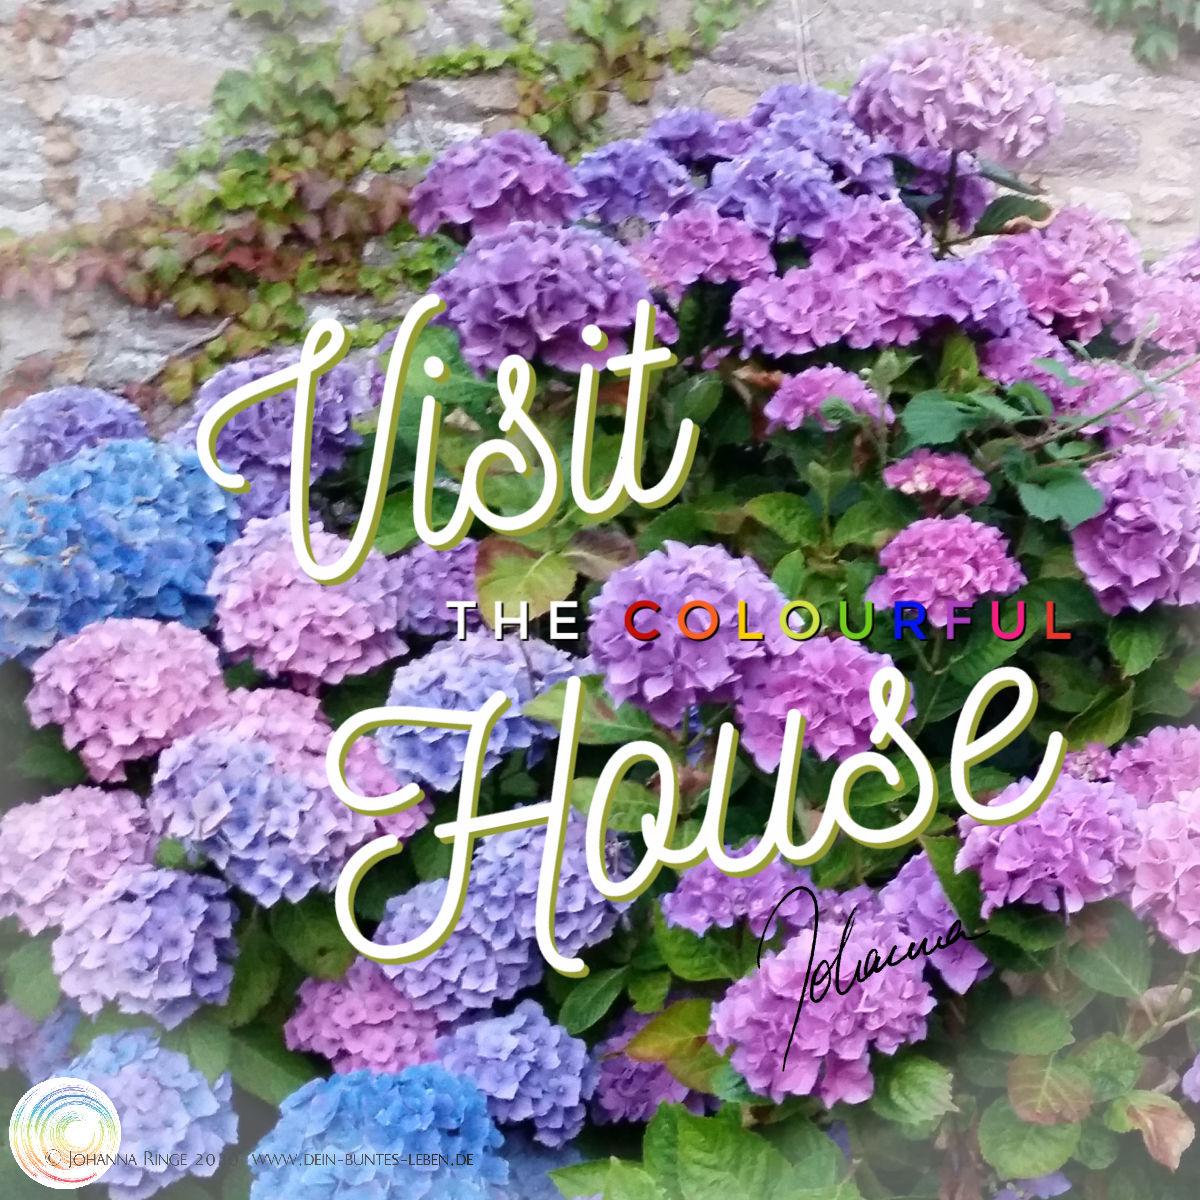 Visit the colourful house (text over hydrangeas) ©Johanna Ringe 2020 www.johannaringe.com